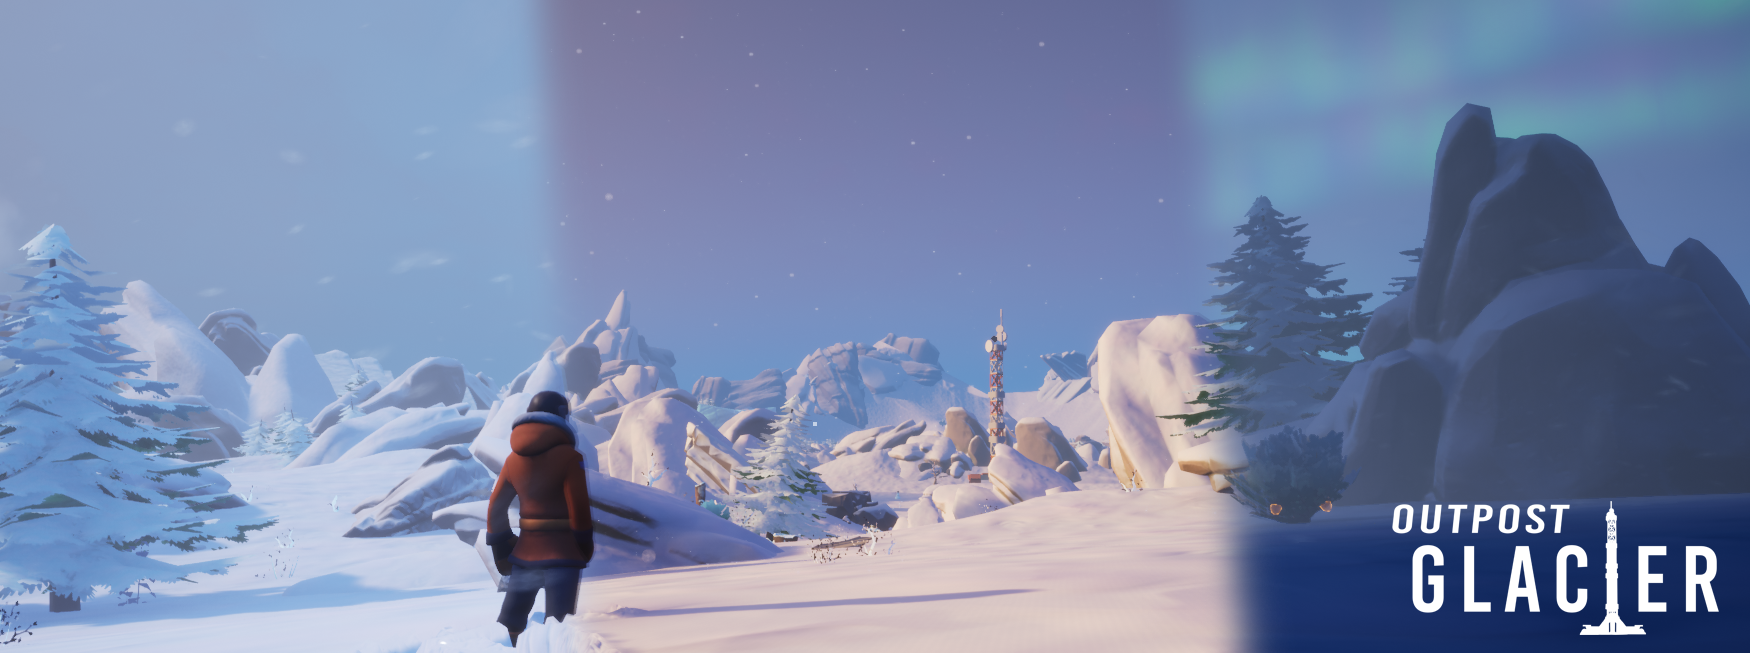 Outpost: Glacier